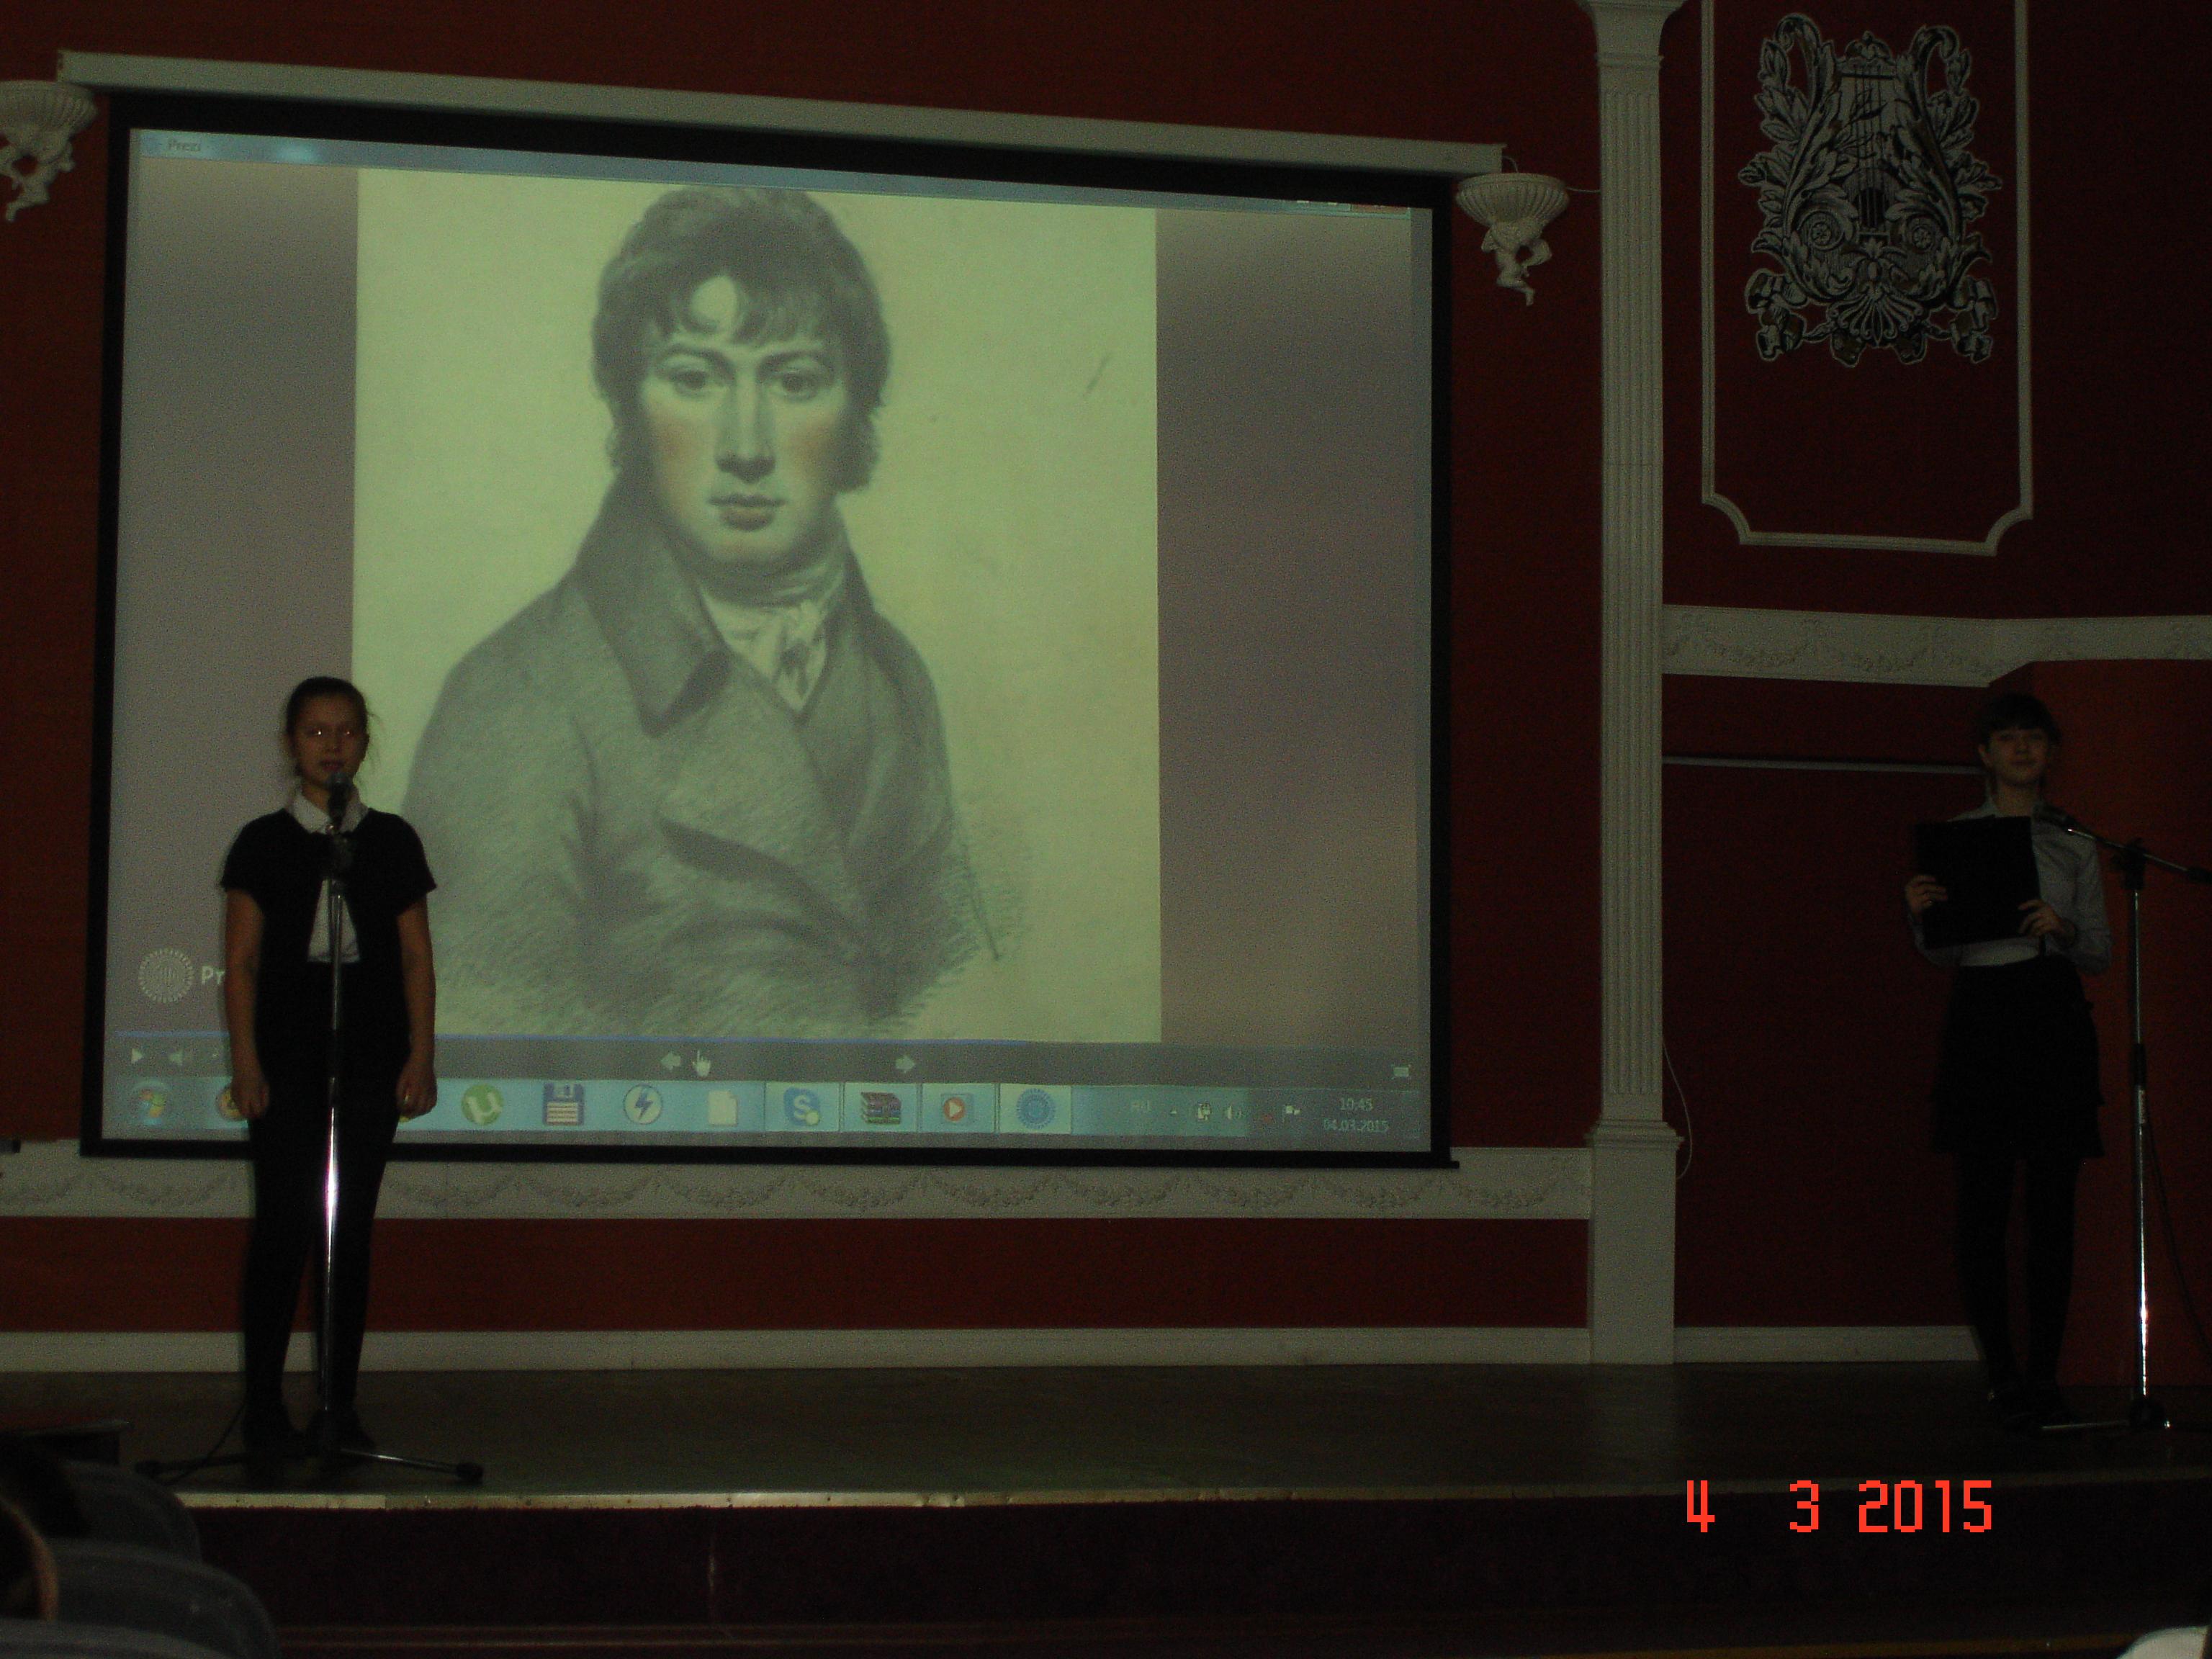 D:\Лилия\ПК\уч год 14-15\мероприятие МУзеи Лондона\DSC02497.JPG